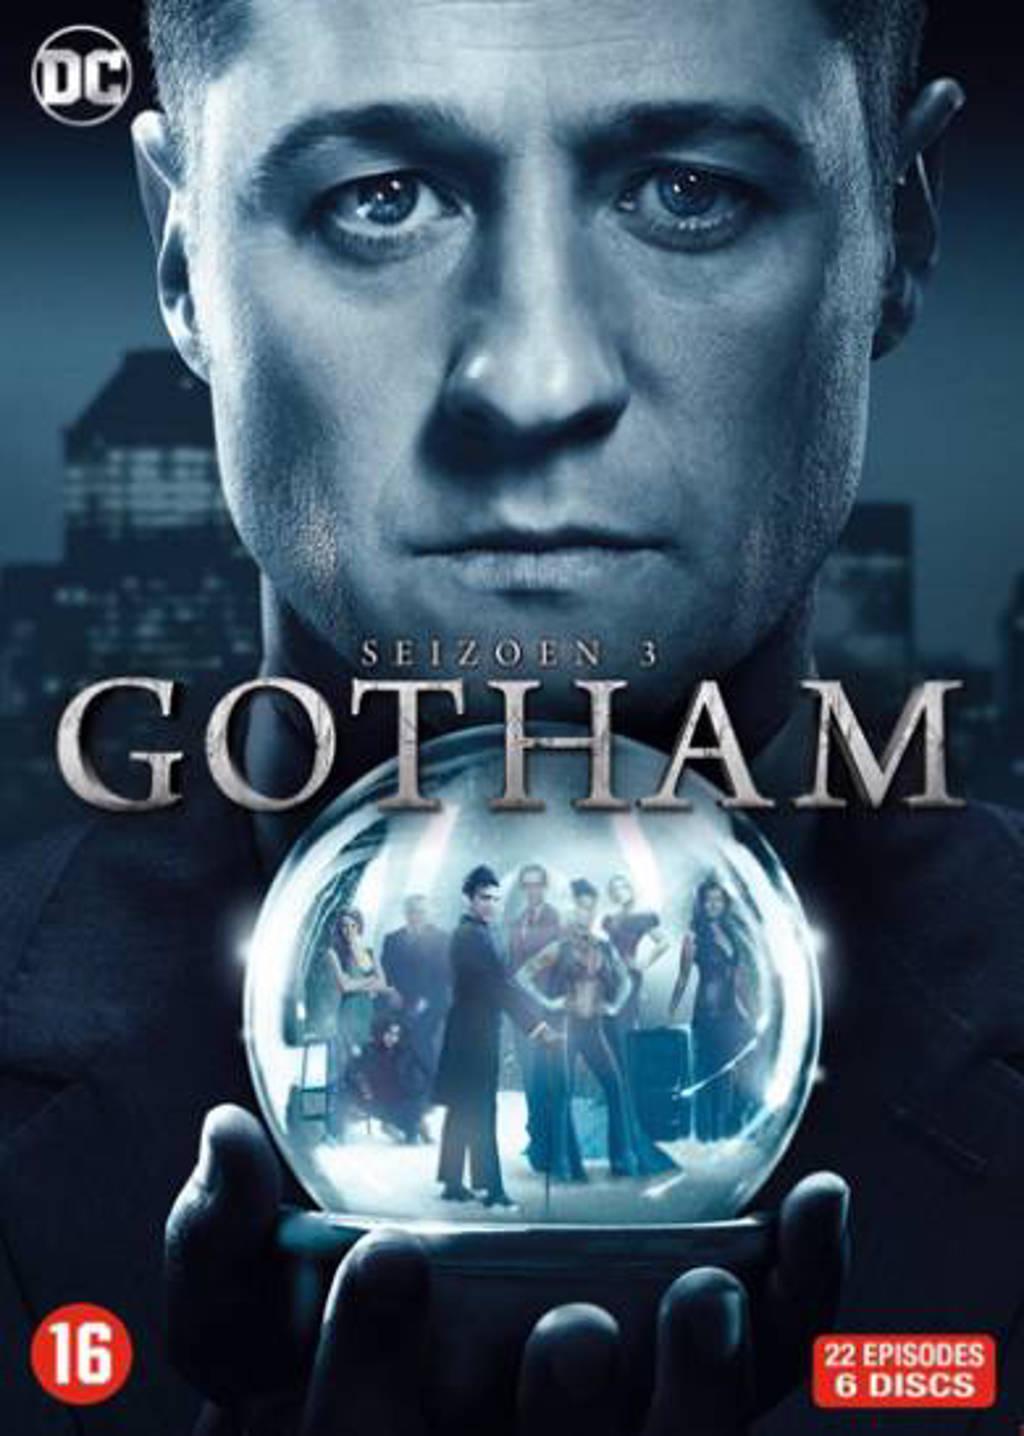 Gotham - Seizoen 3  (DVD)